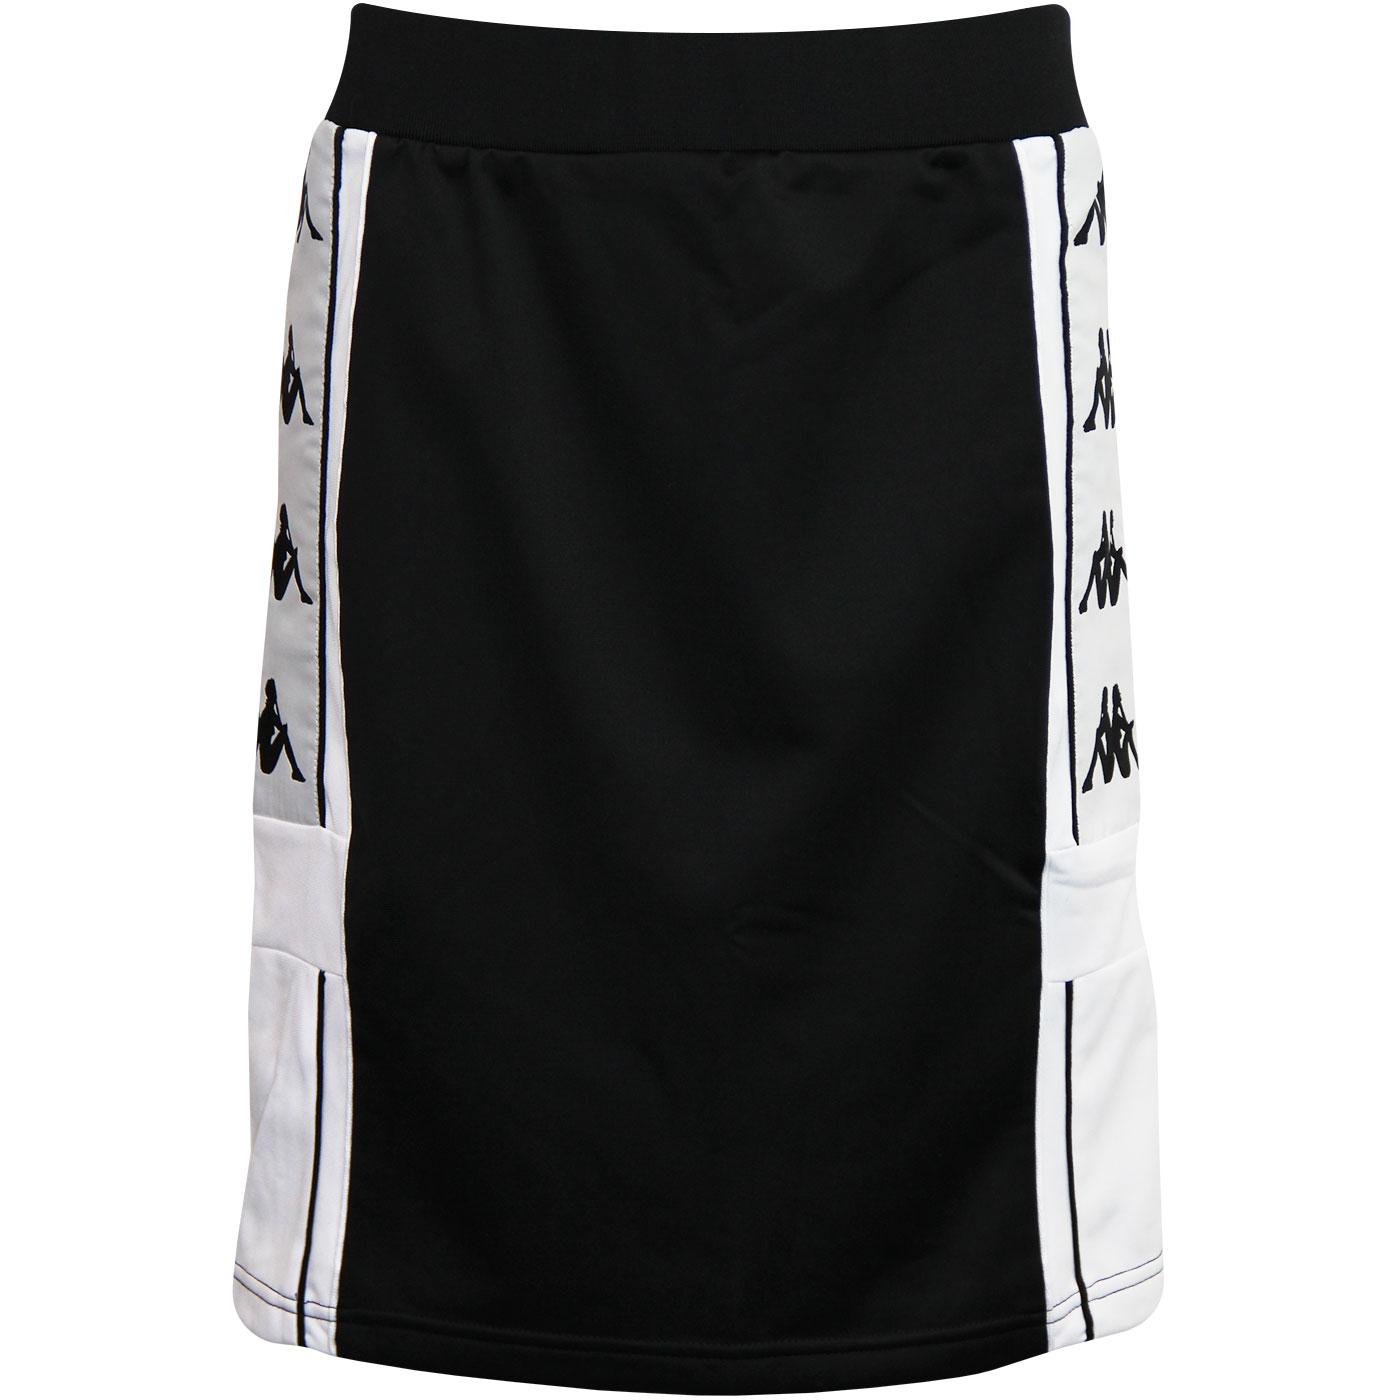 Askir Banda KAPPA Retro 1990s Skirt (Black/White)